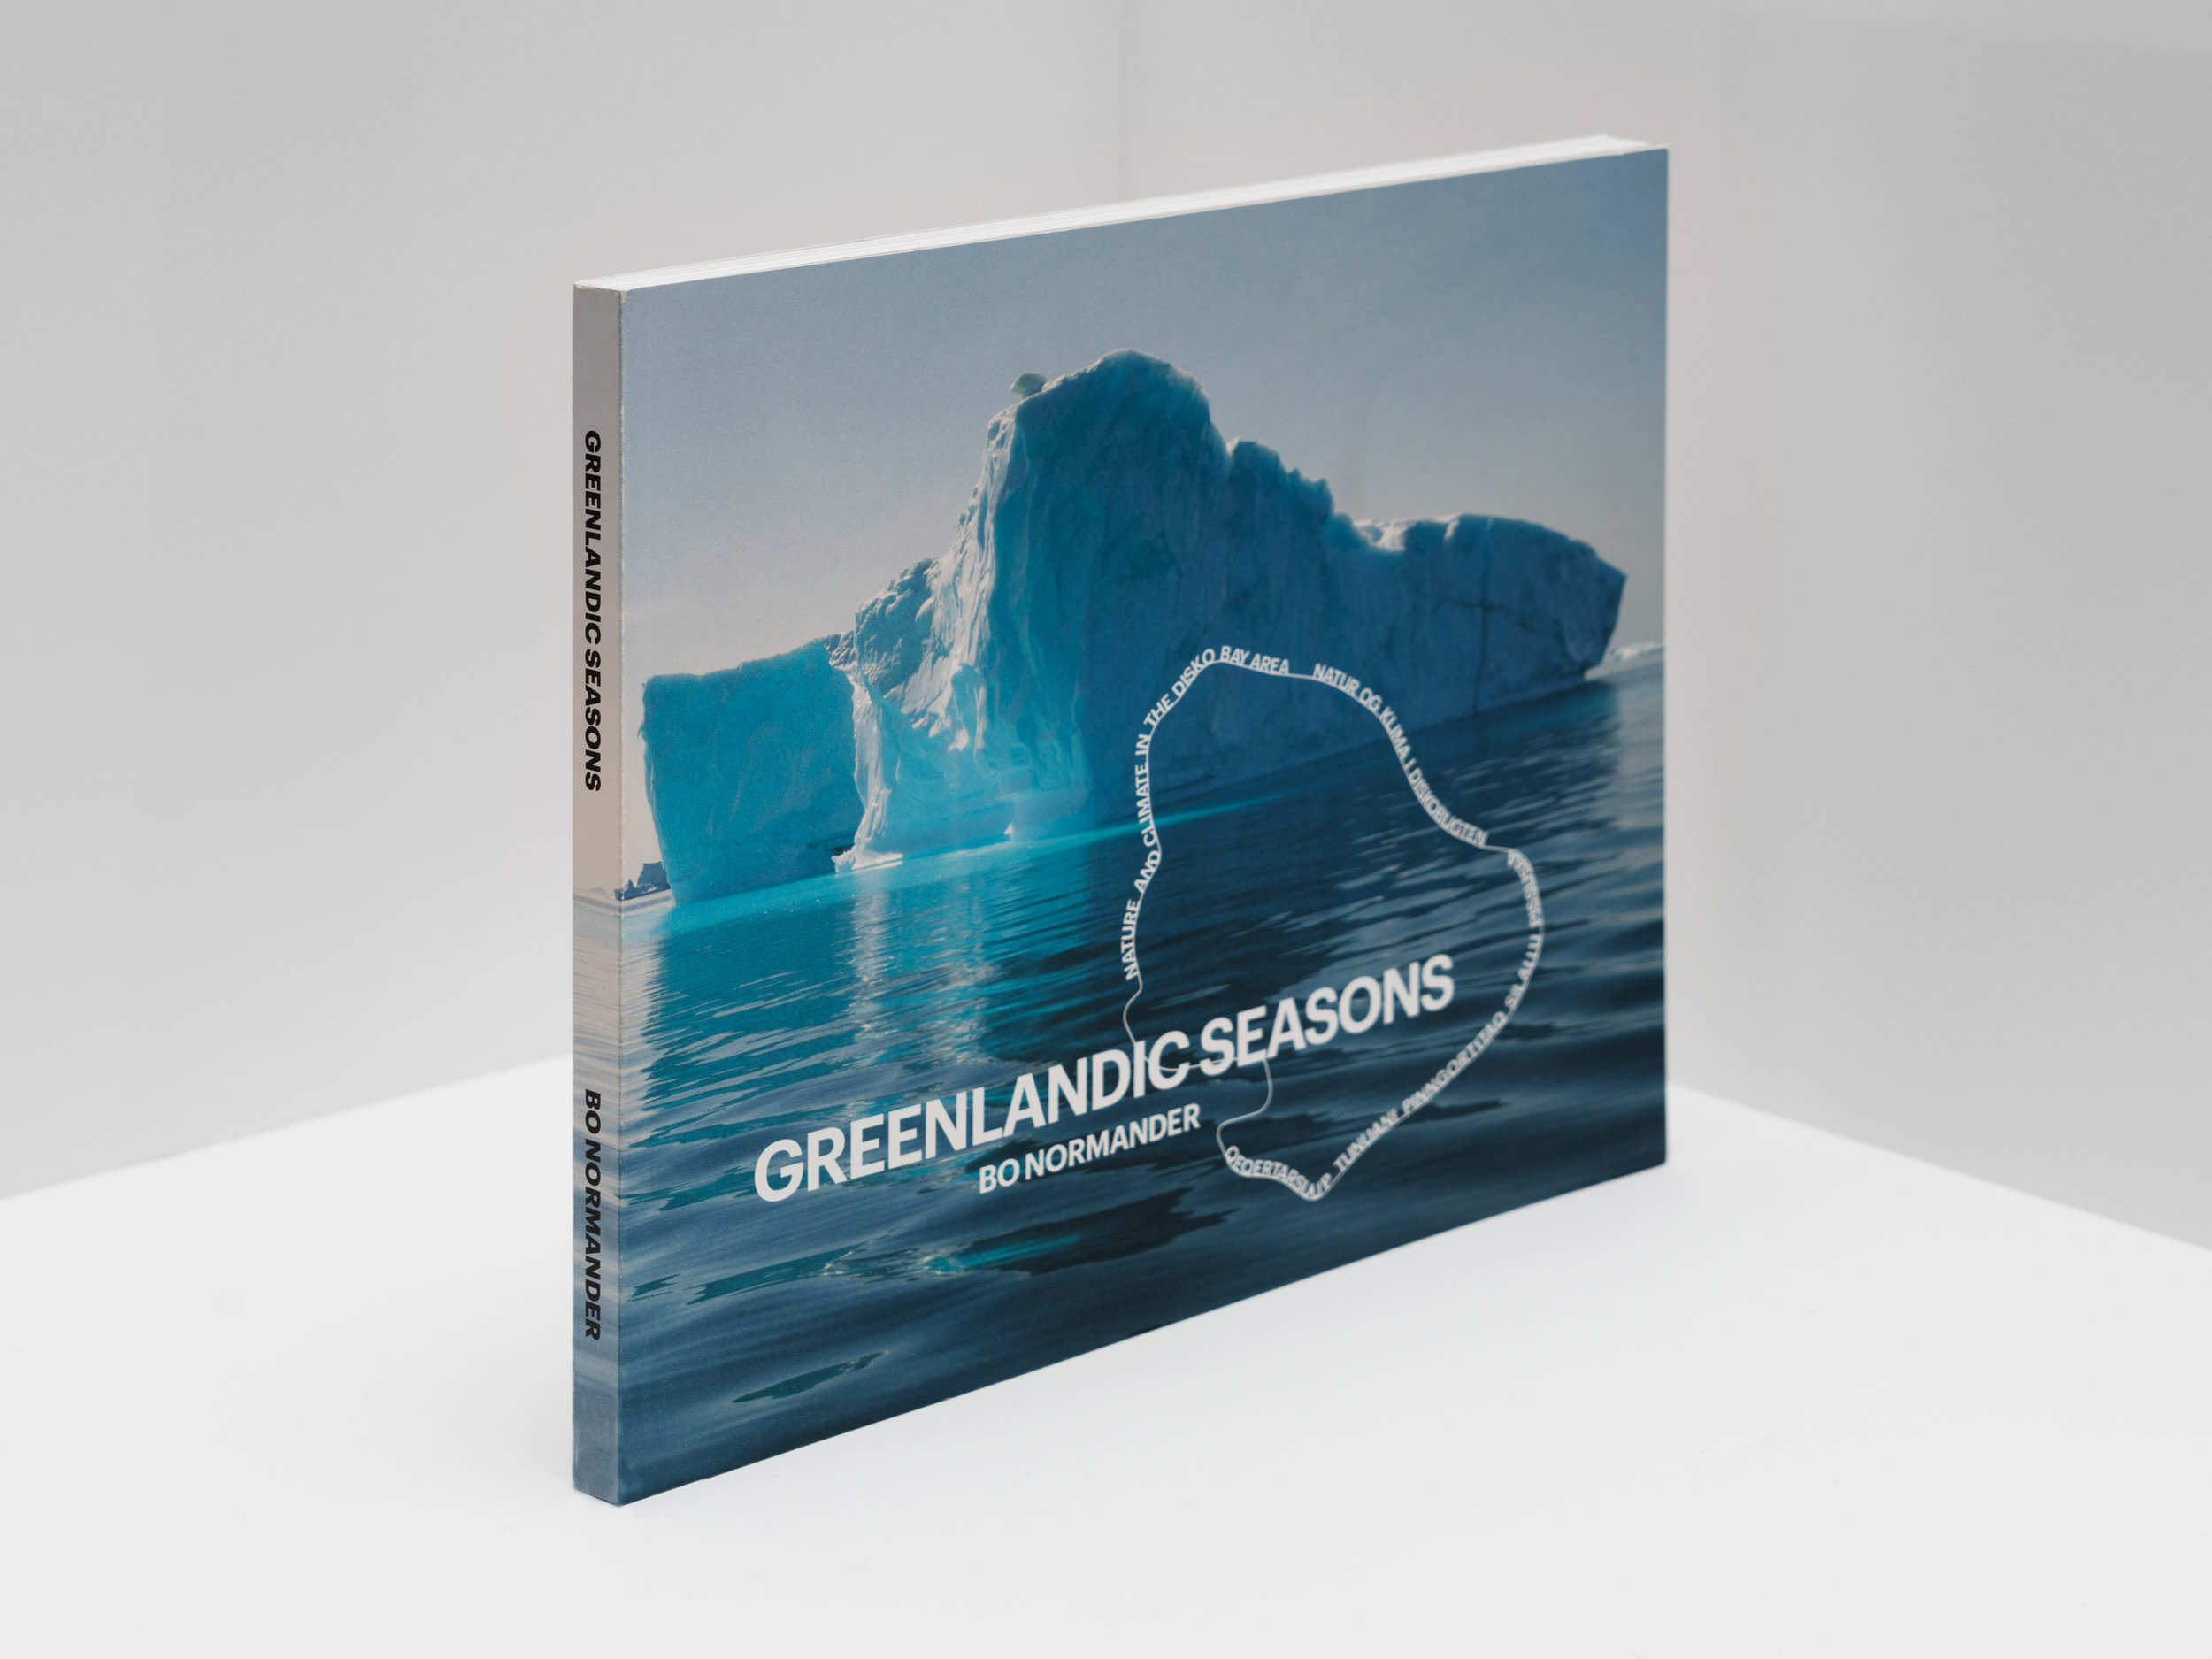 Greenlandic Seasons _01.jpg